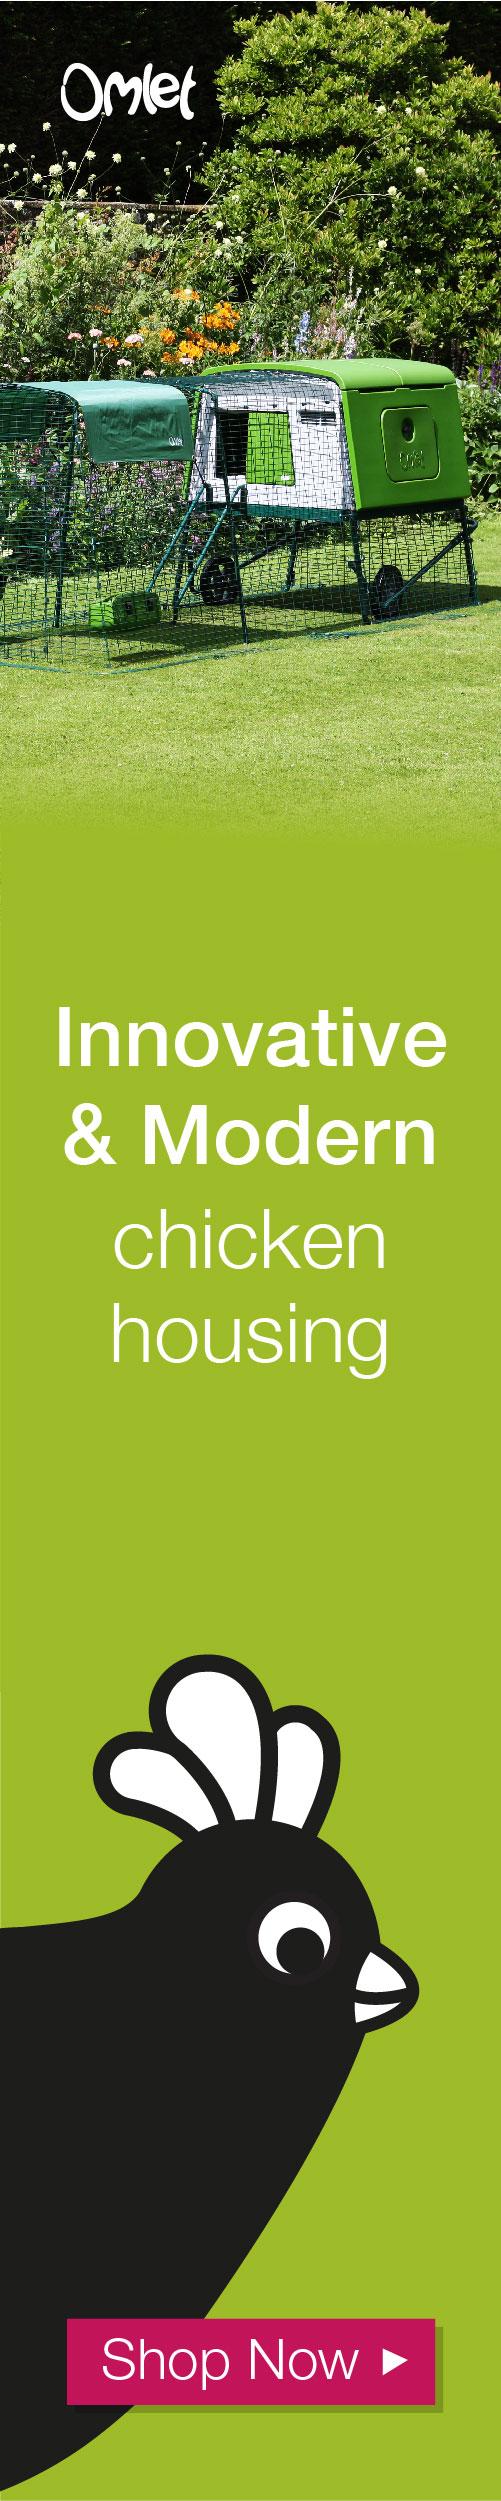 Innovative and modern chicken housing